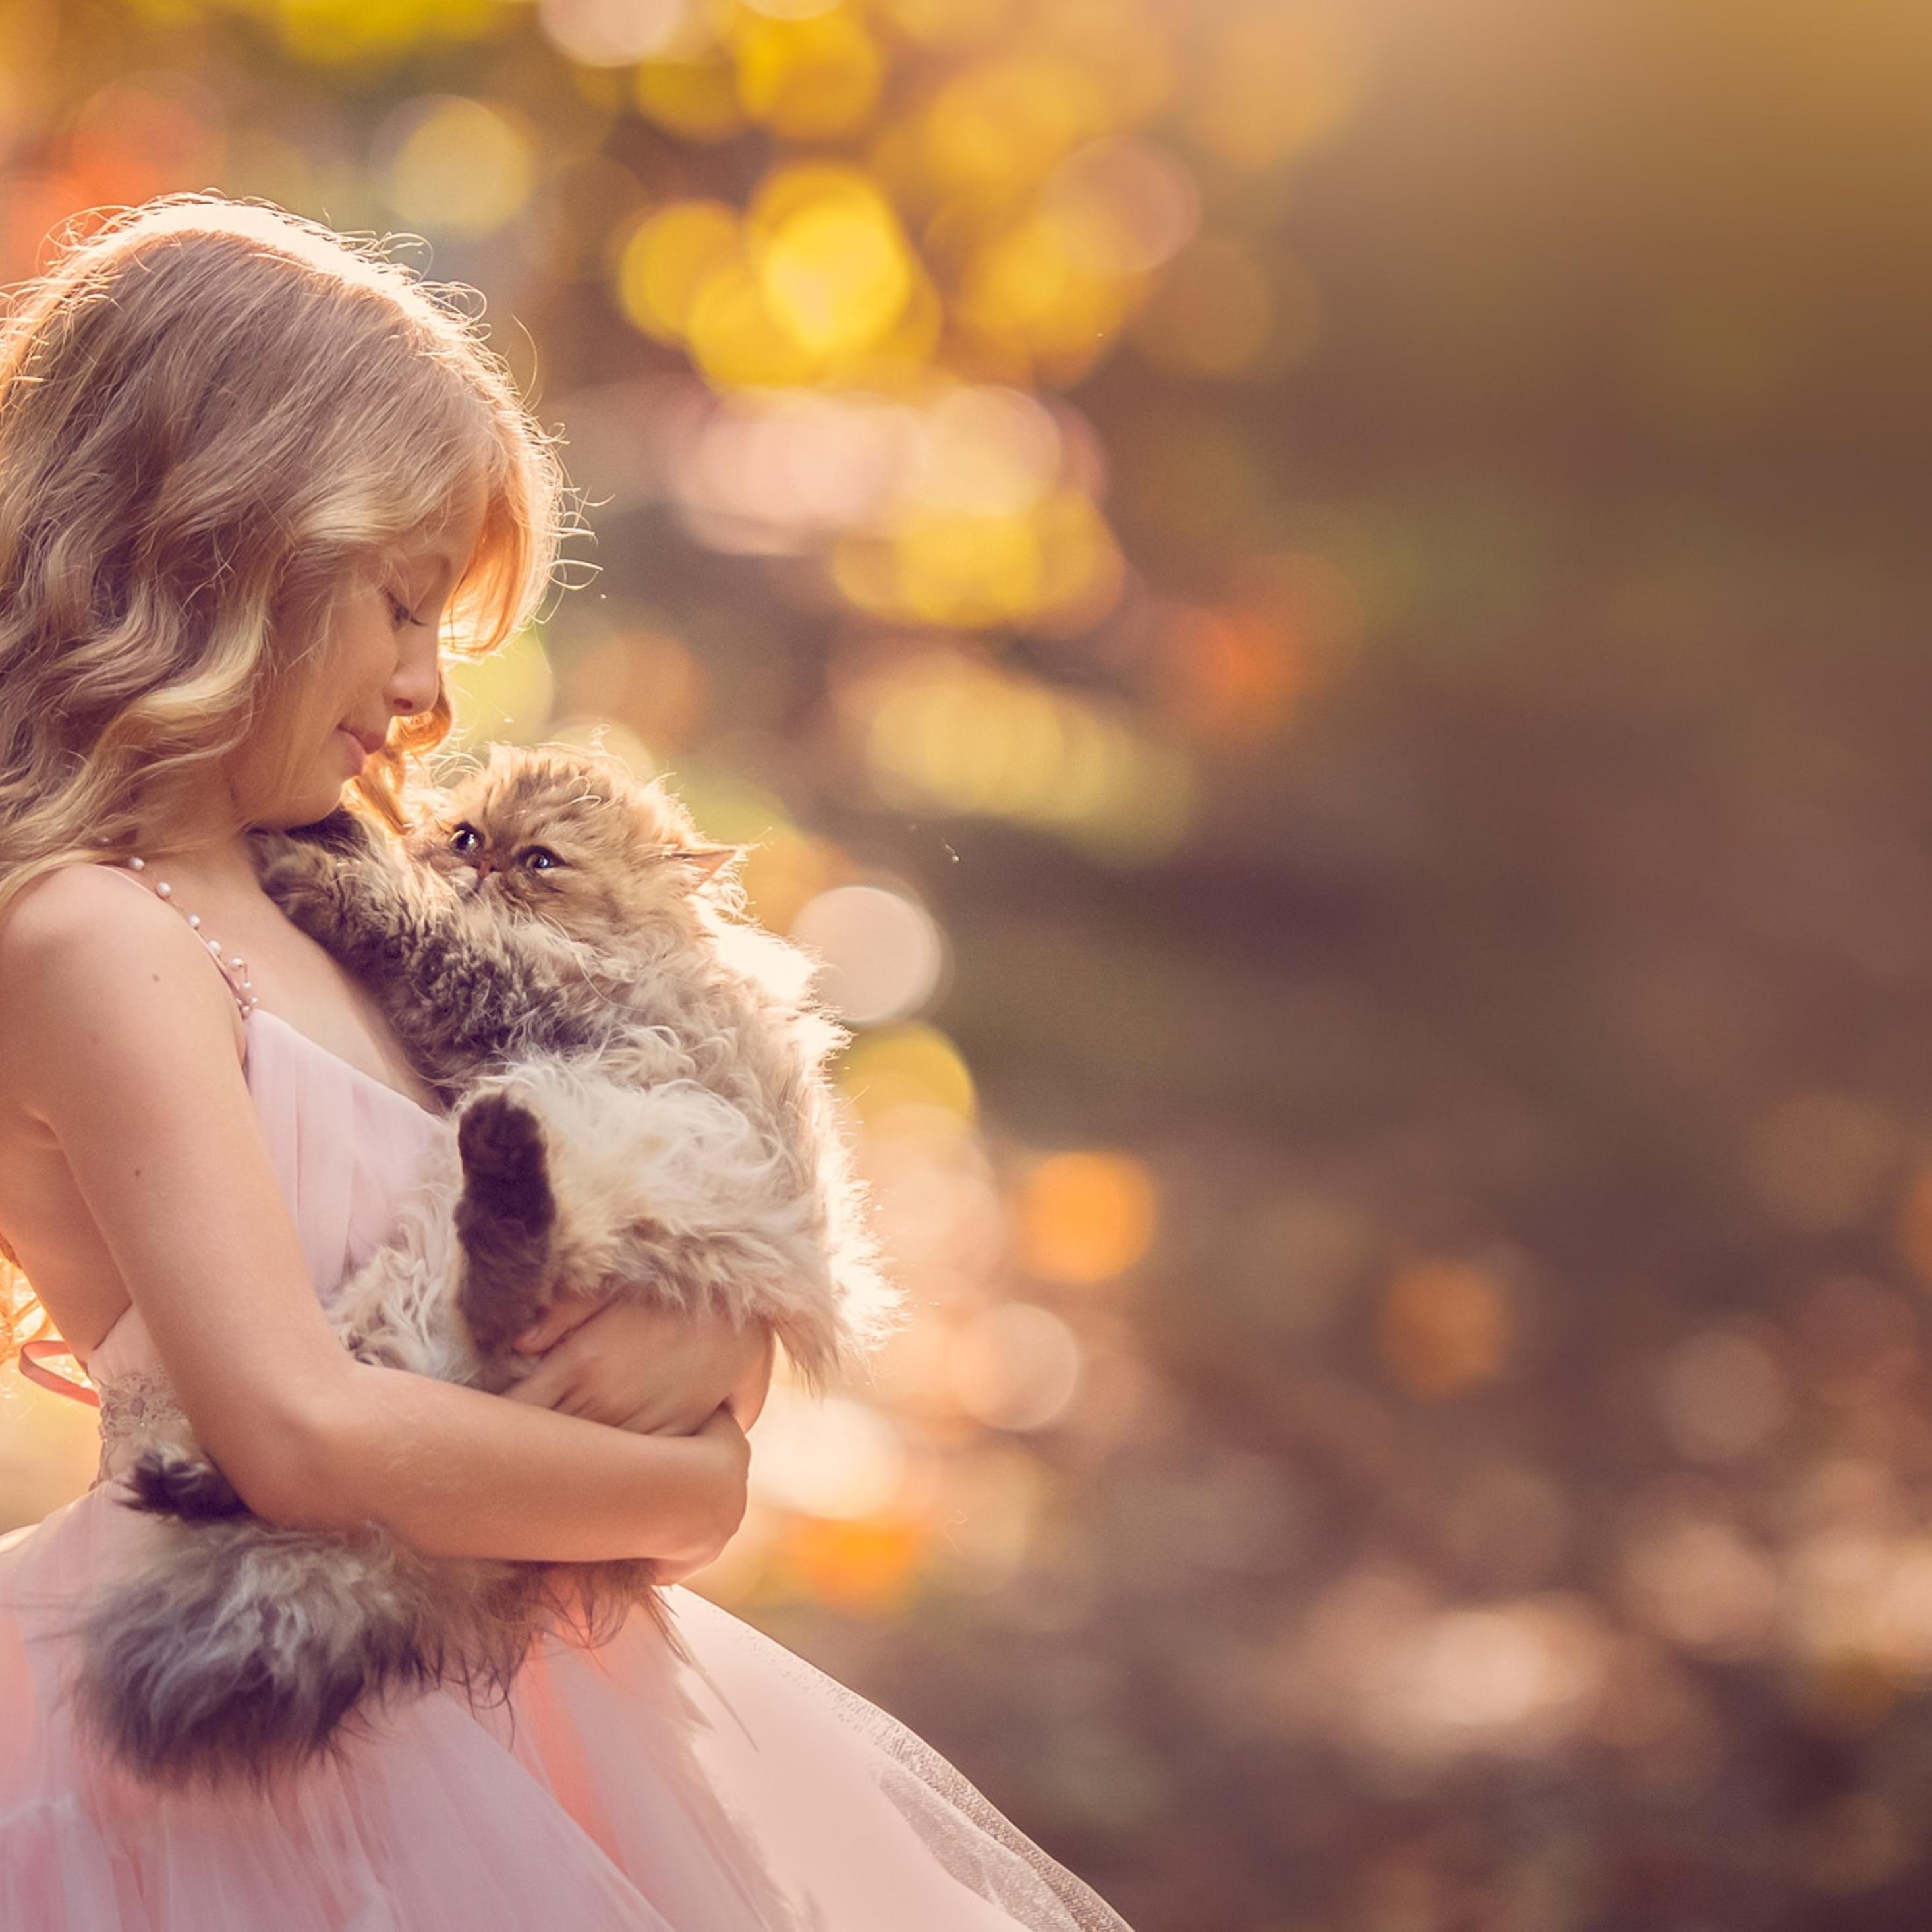 little-girl-with-cat-qhd.jpg